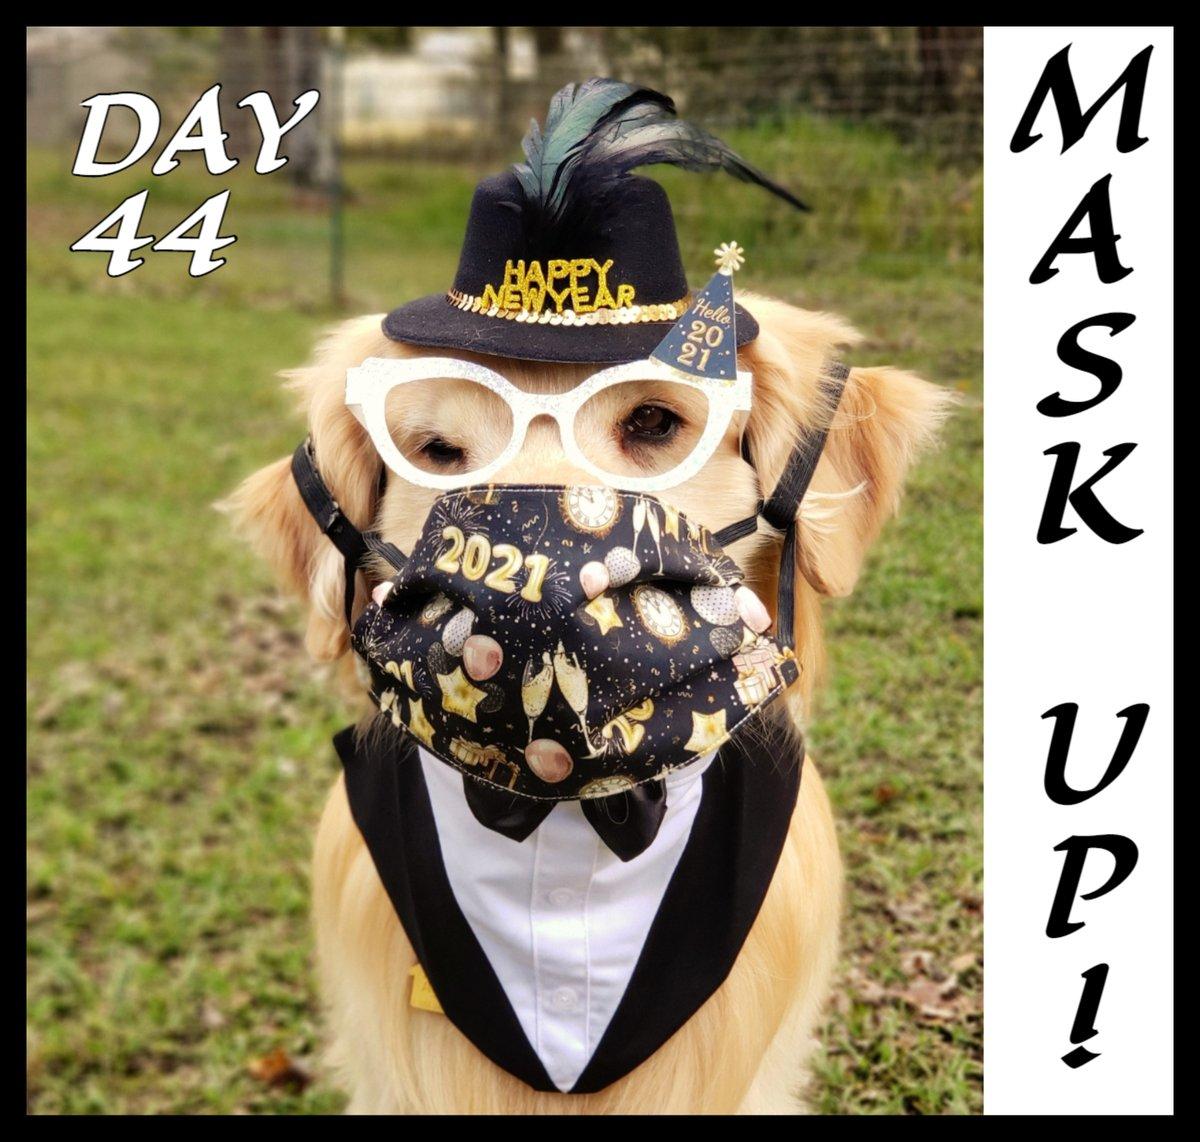 Day 44 of 100. Remember to😷#MaskUp!  🐶#ChampBiden #MajorAndChamp #Champ #Major #DOTUS #WhiteHouseDogs #BarkingForBiden @TheOvalPawffice @TheFirstDogs  #WearAMask #SocialDistancing #WashYourHands #AvoidCrowds #COVID19💉#vaccine🥜#foodallergies #servicedog🐕🦺#dogsoftwitter